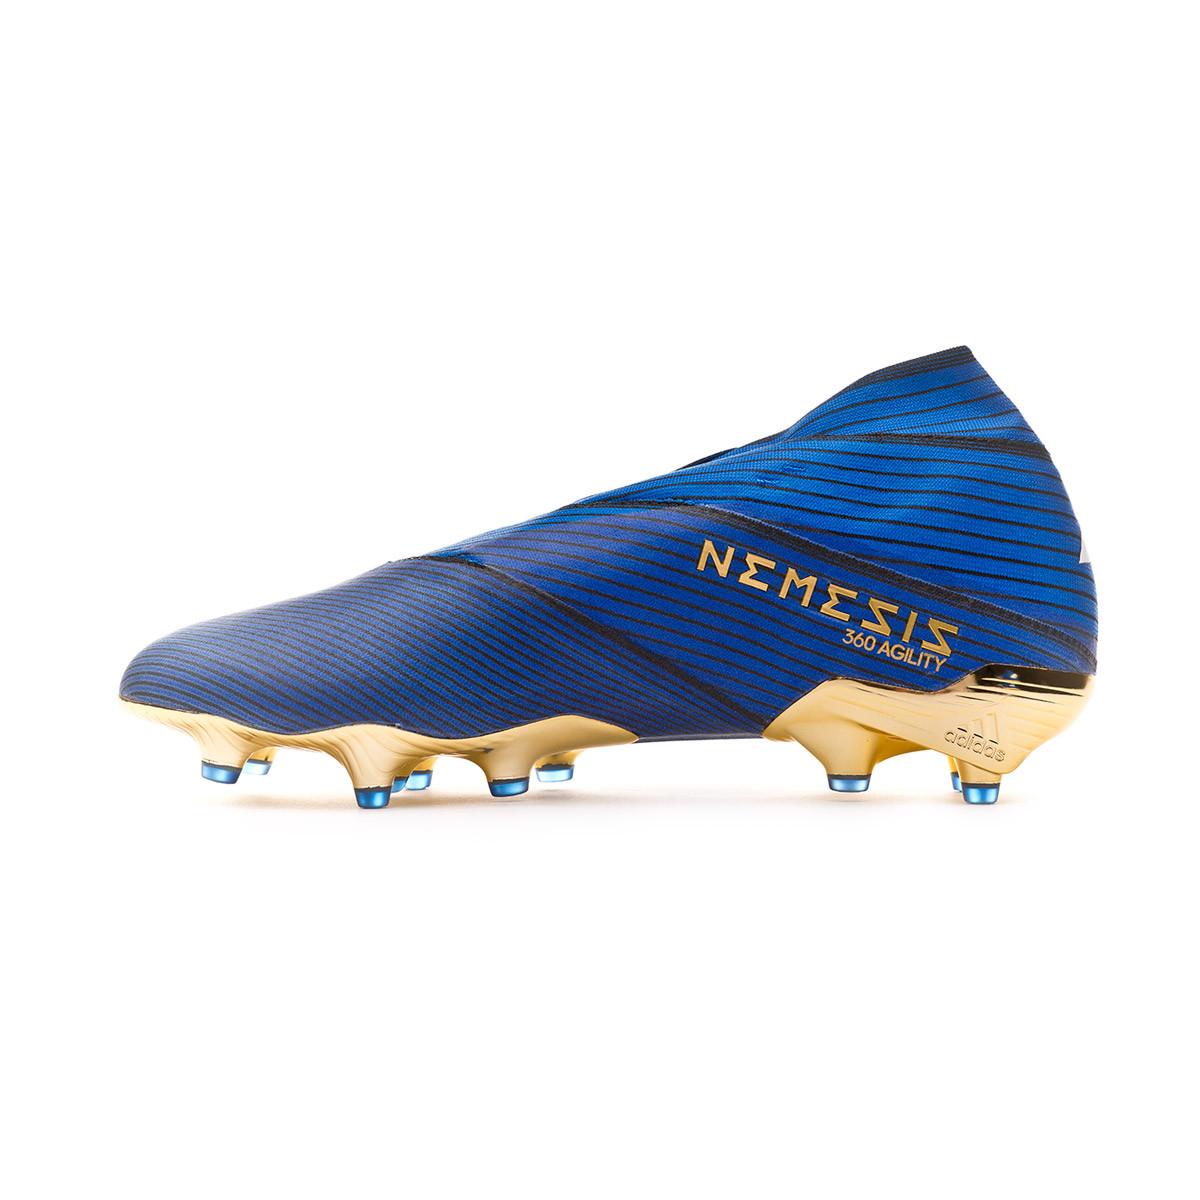 Bota Nemeziz 19 Fg Football Blue White Core Black